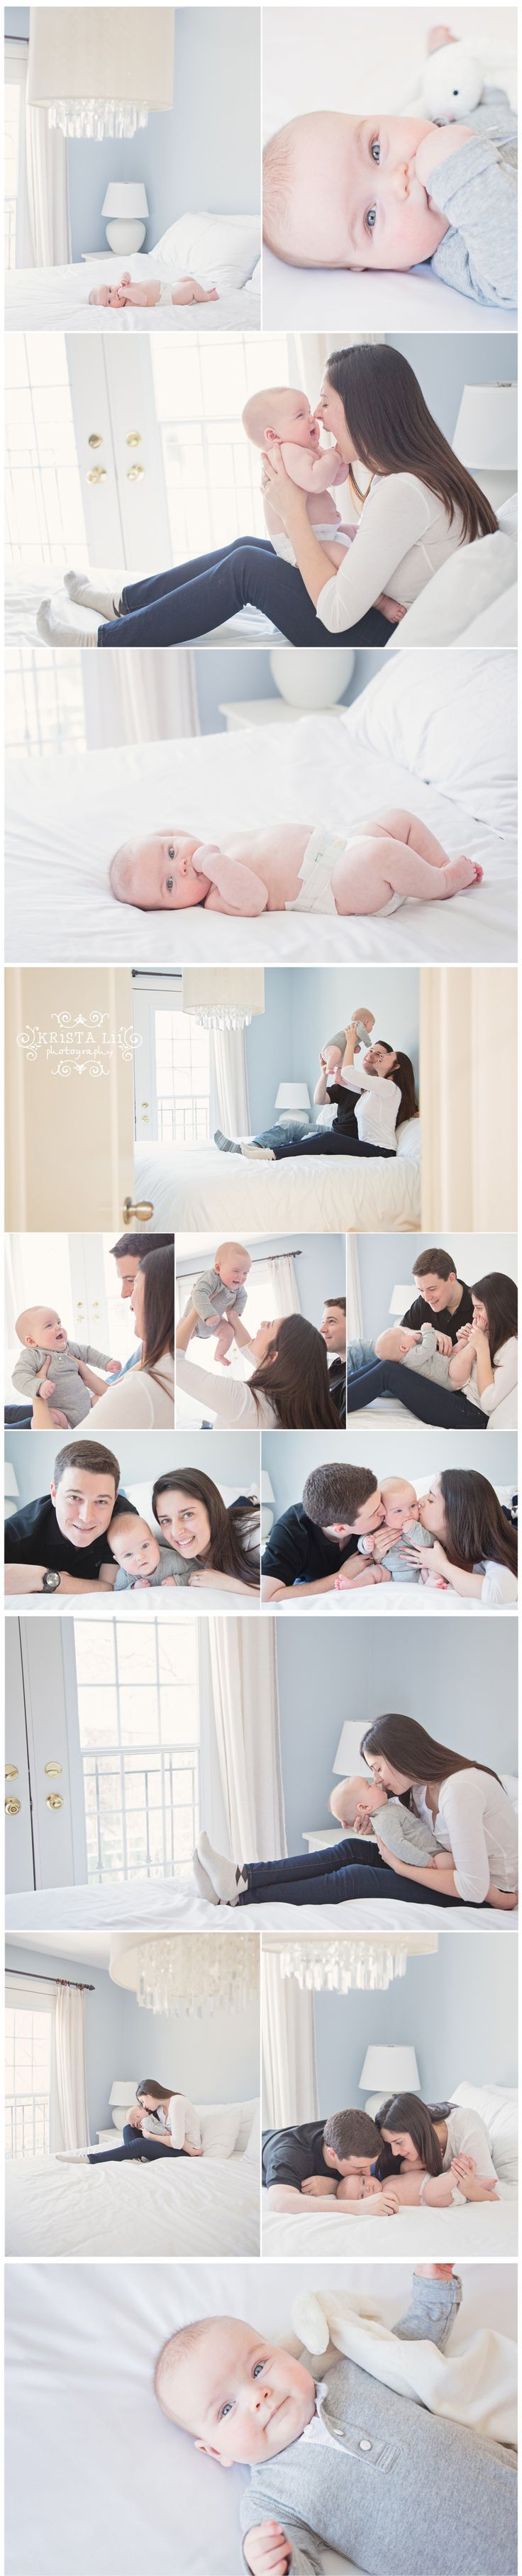 Toronto Lifestyle Newborn | Krista Lii Photography